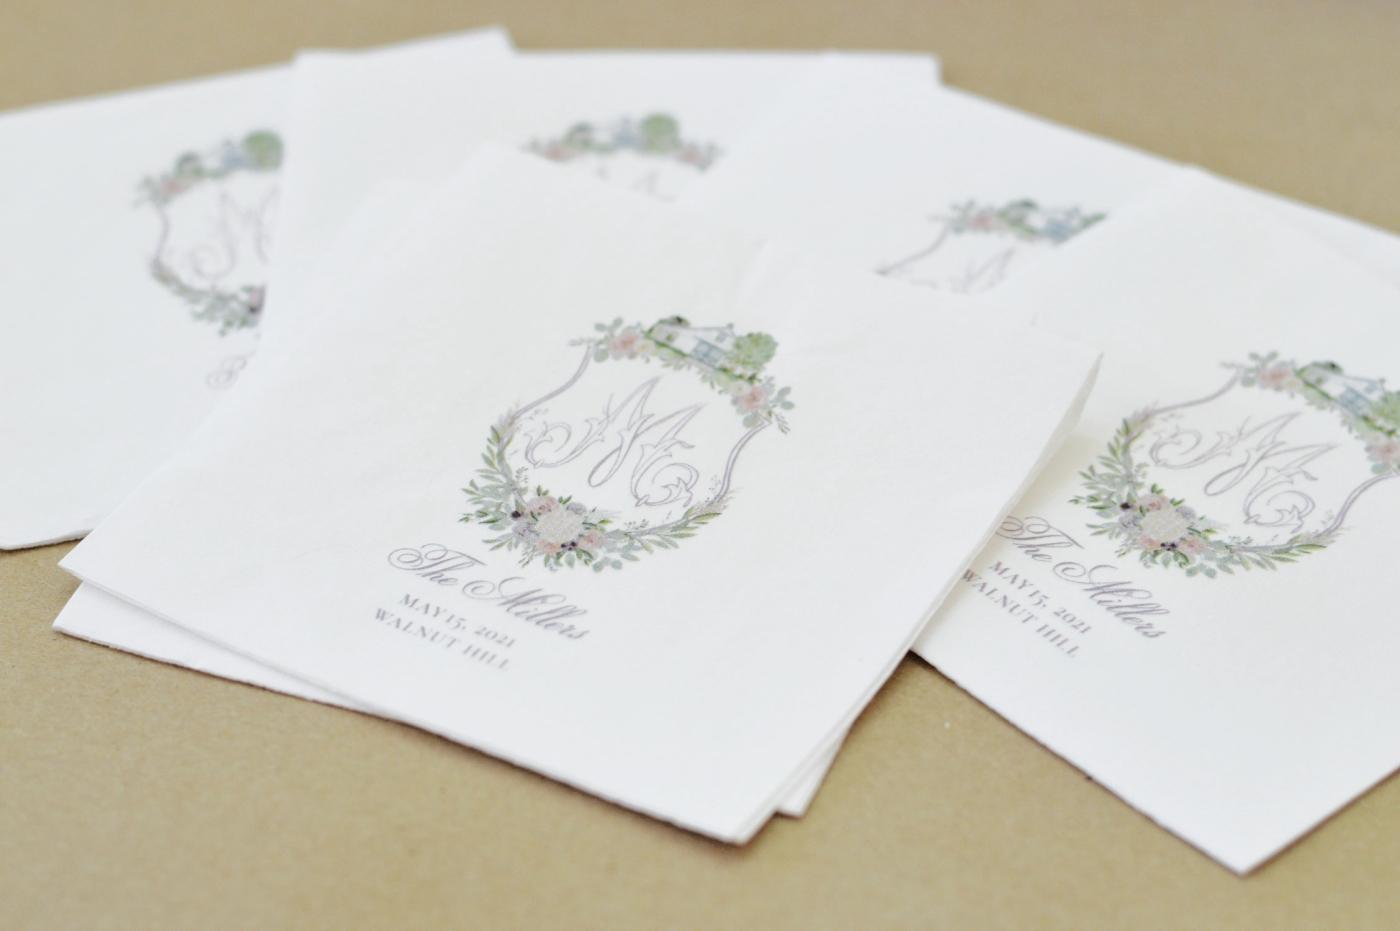 custom designed cocktail napkins